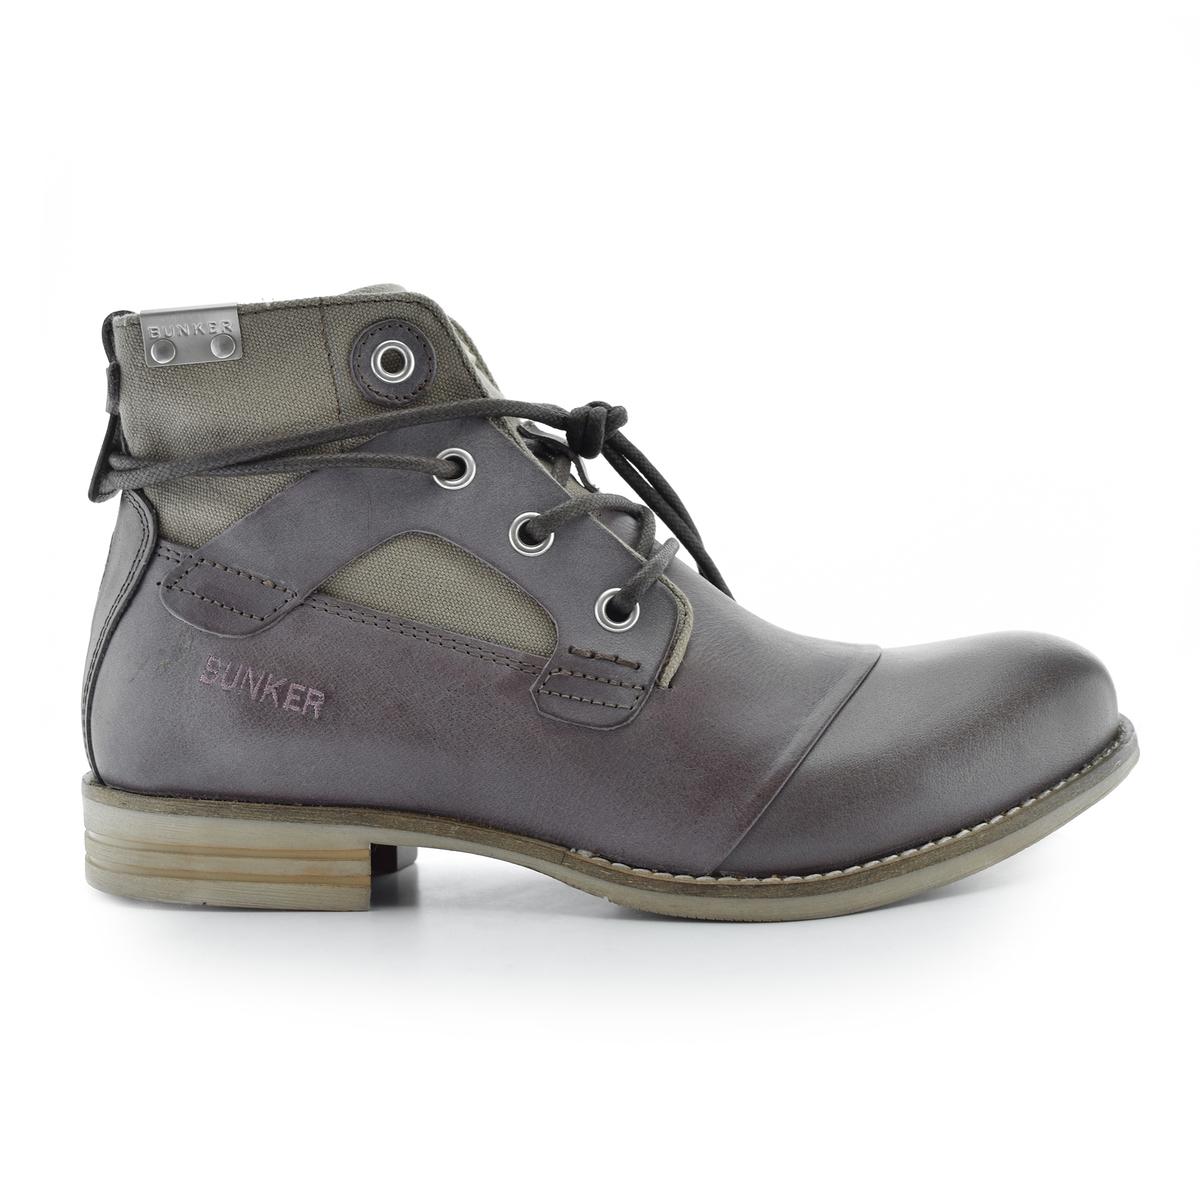 Ботильоны кожаные на шнуровке Yon цены онлайн